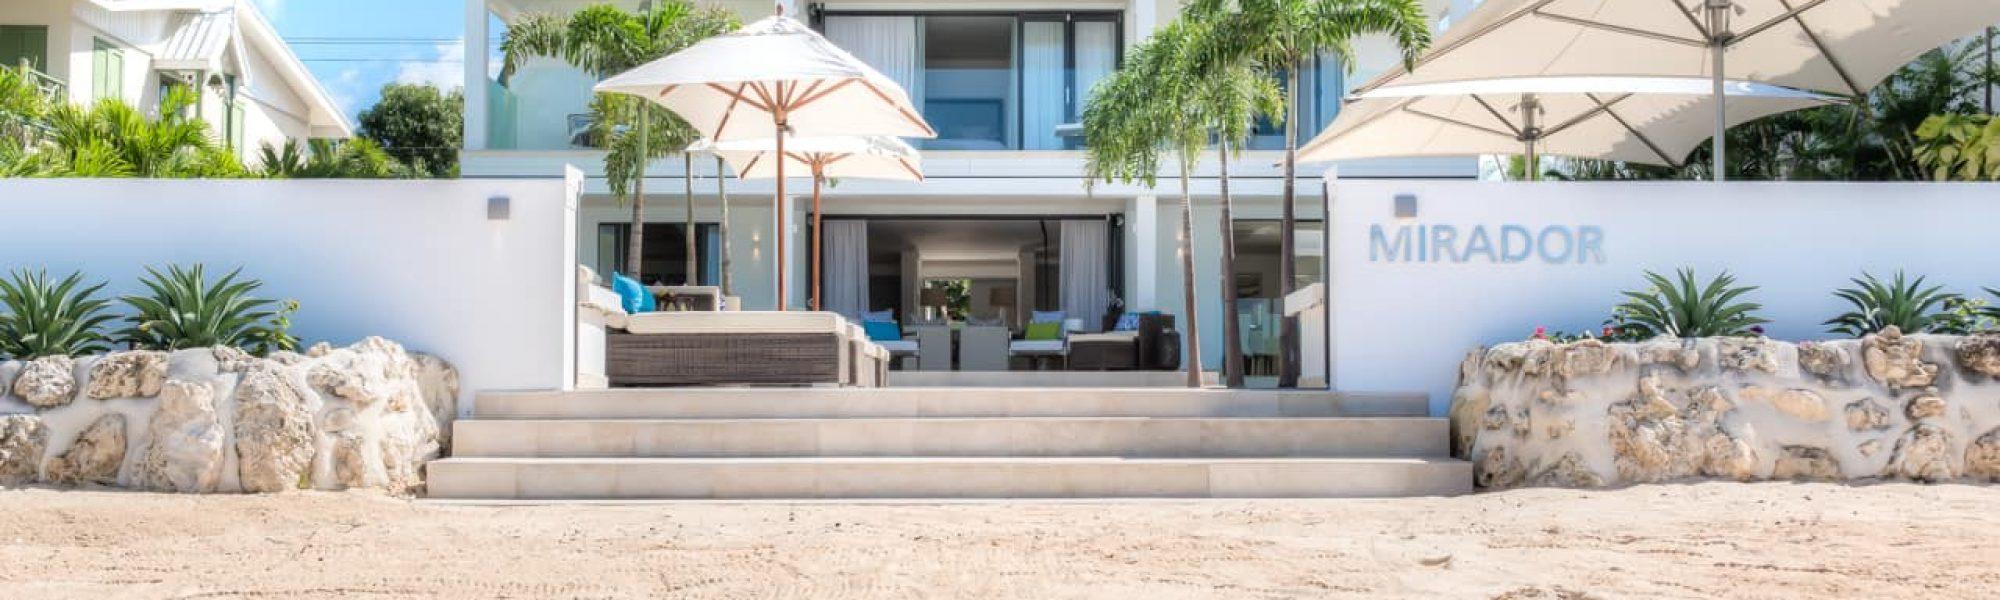 37 villa front view low res